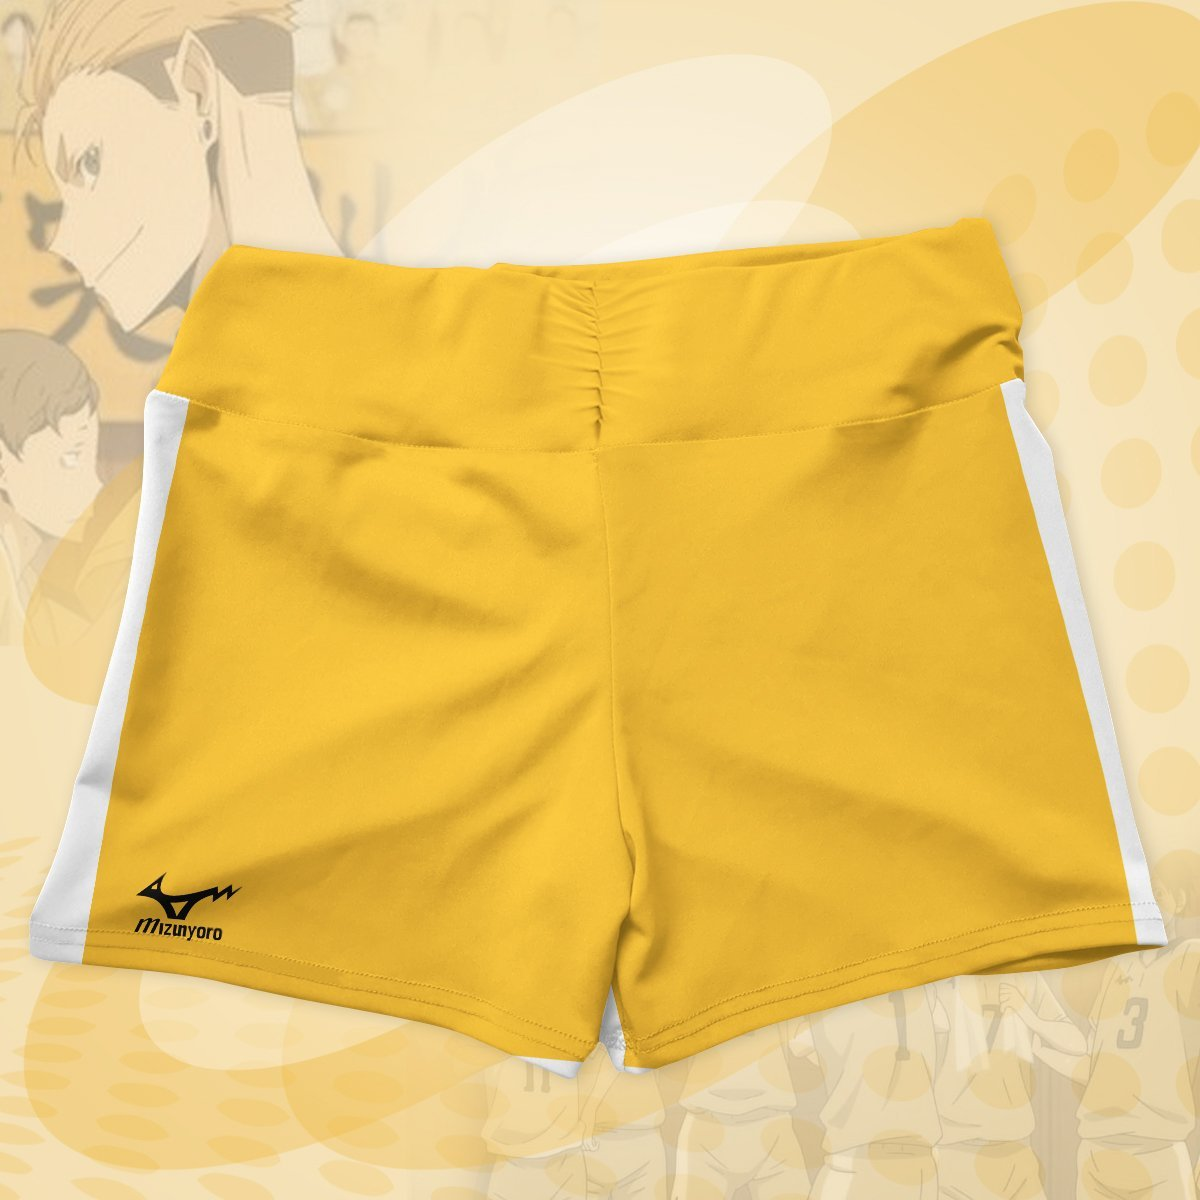 team johzenji active wear set 484114 - Anime Swimsuits